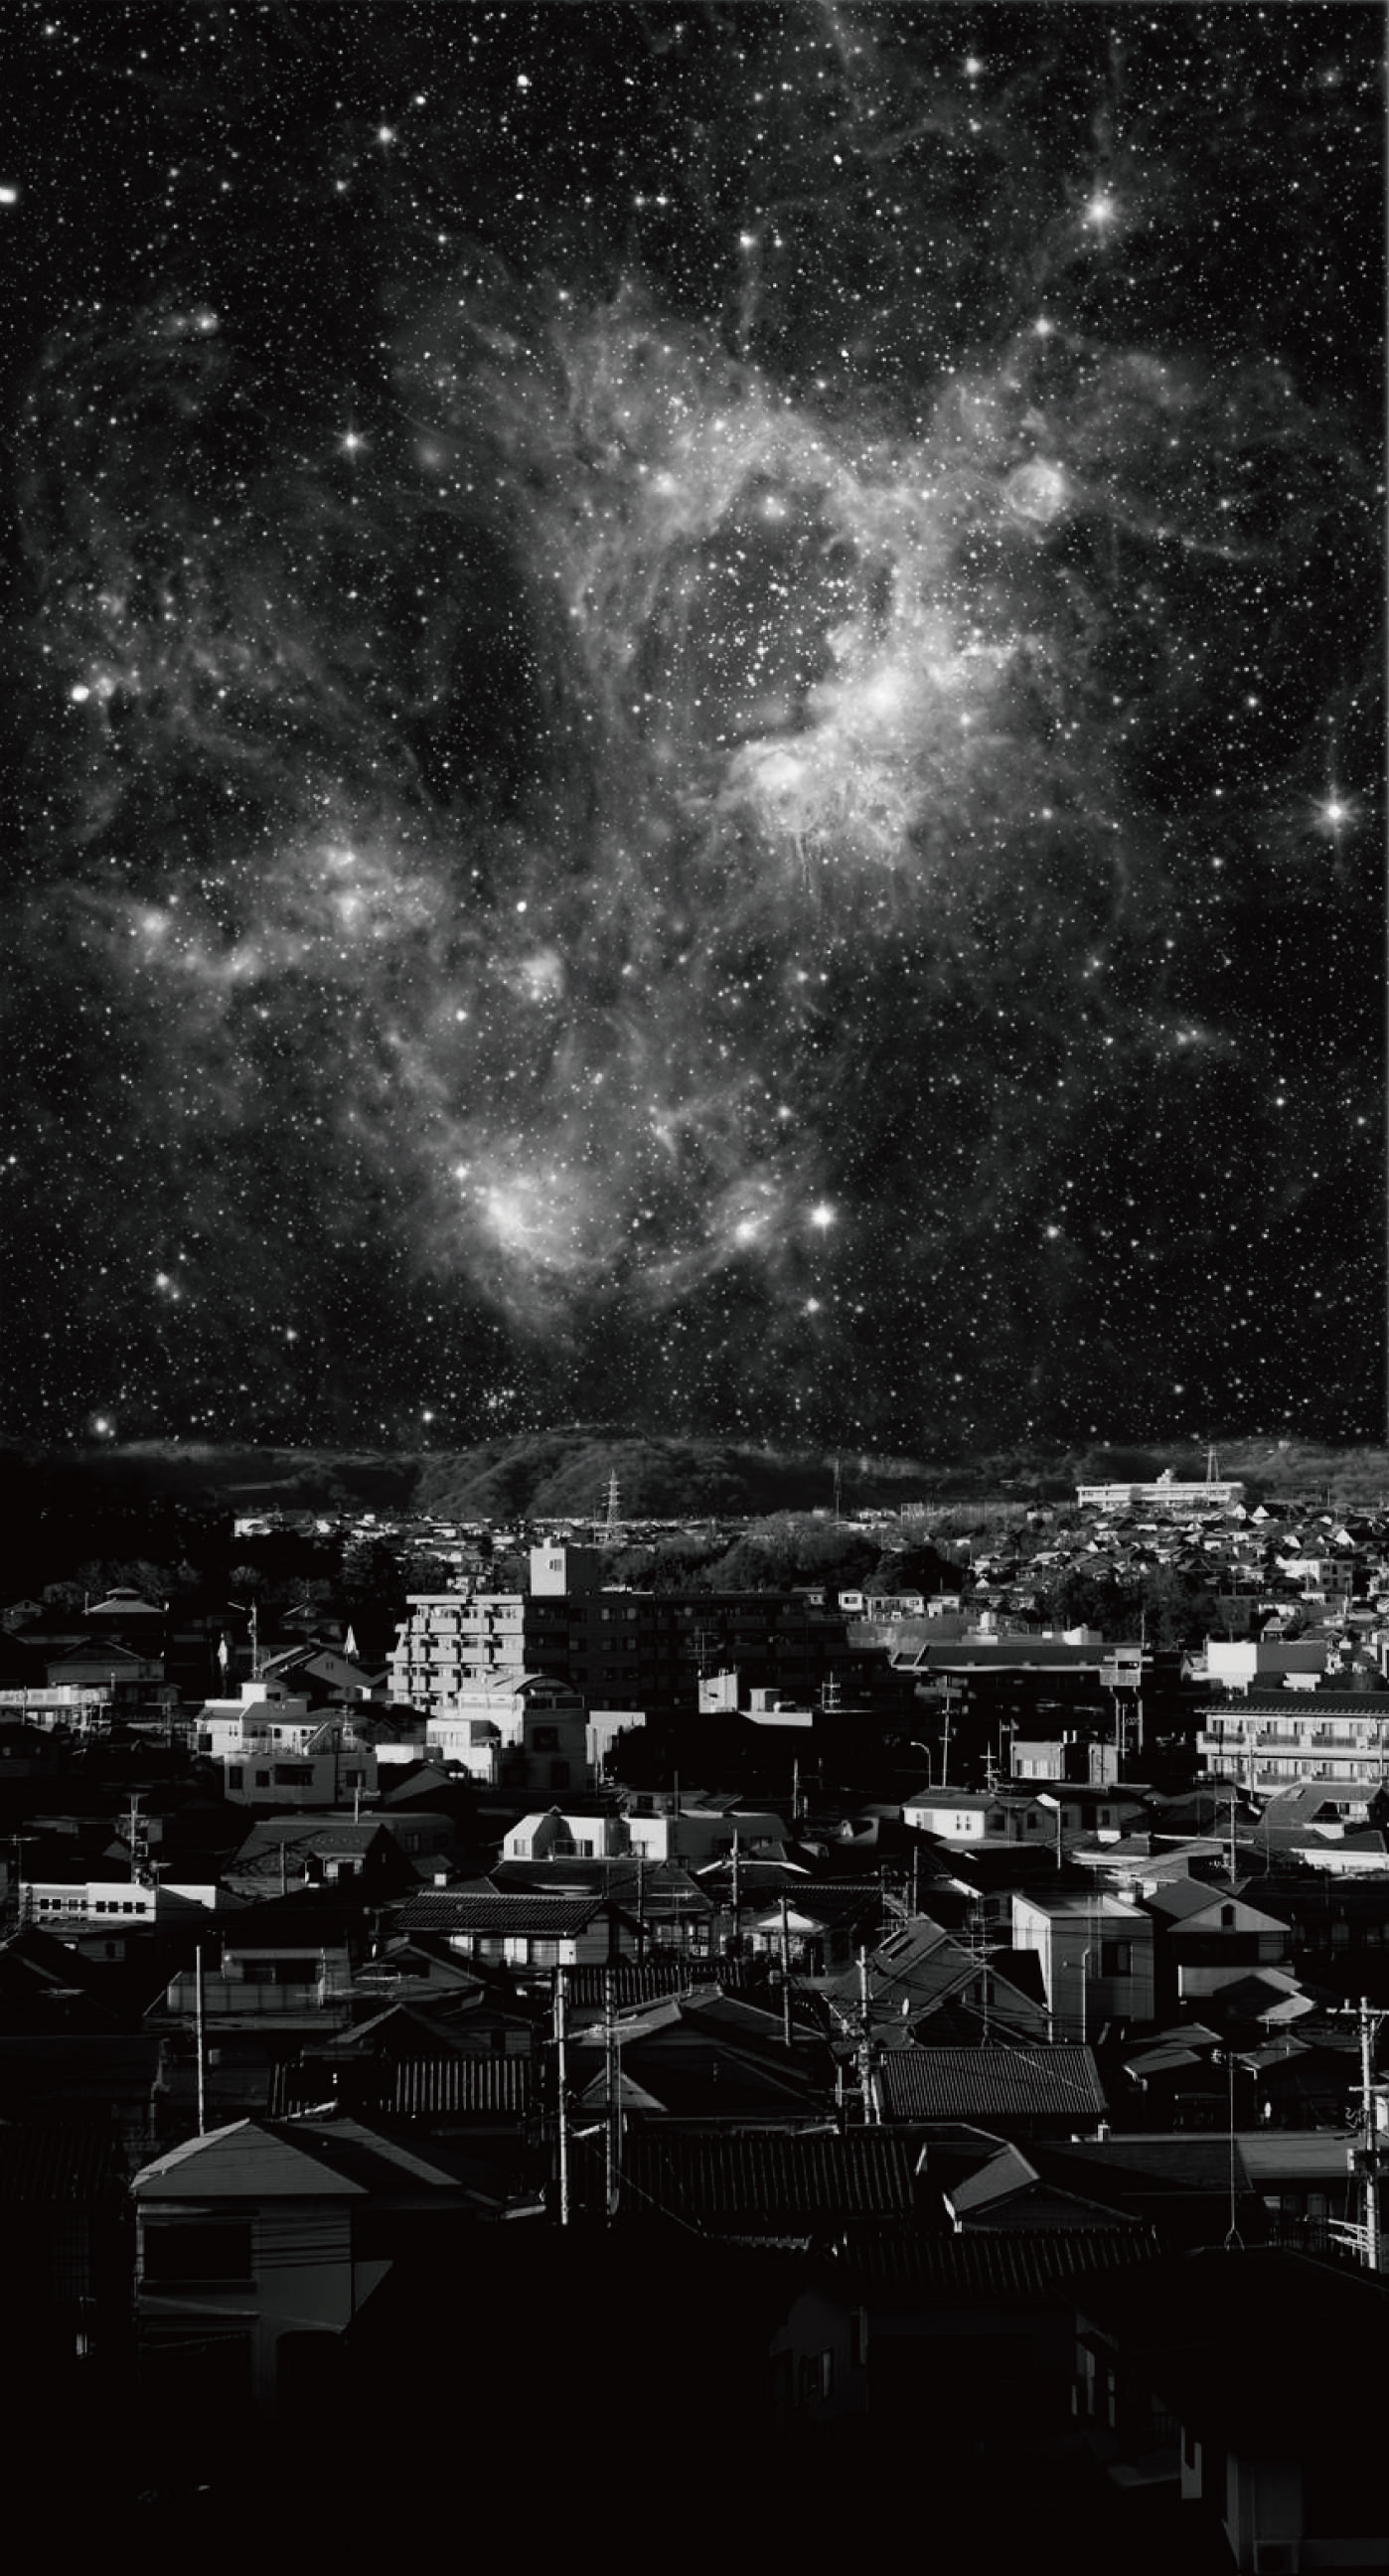 Landscape Night Sky Black Wallpaper Sc Iphone6splus